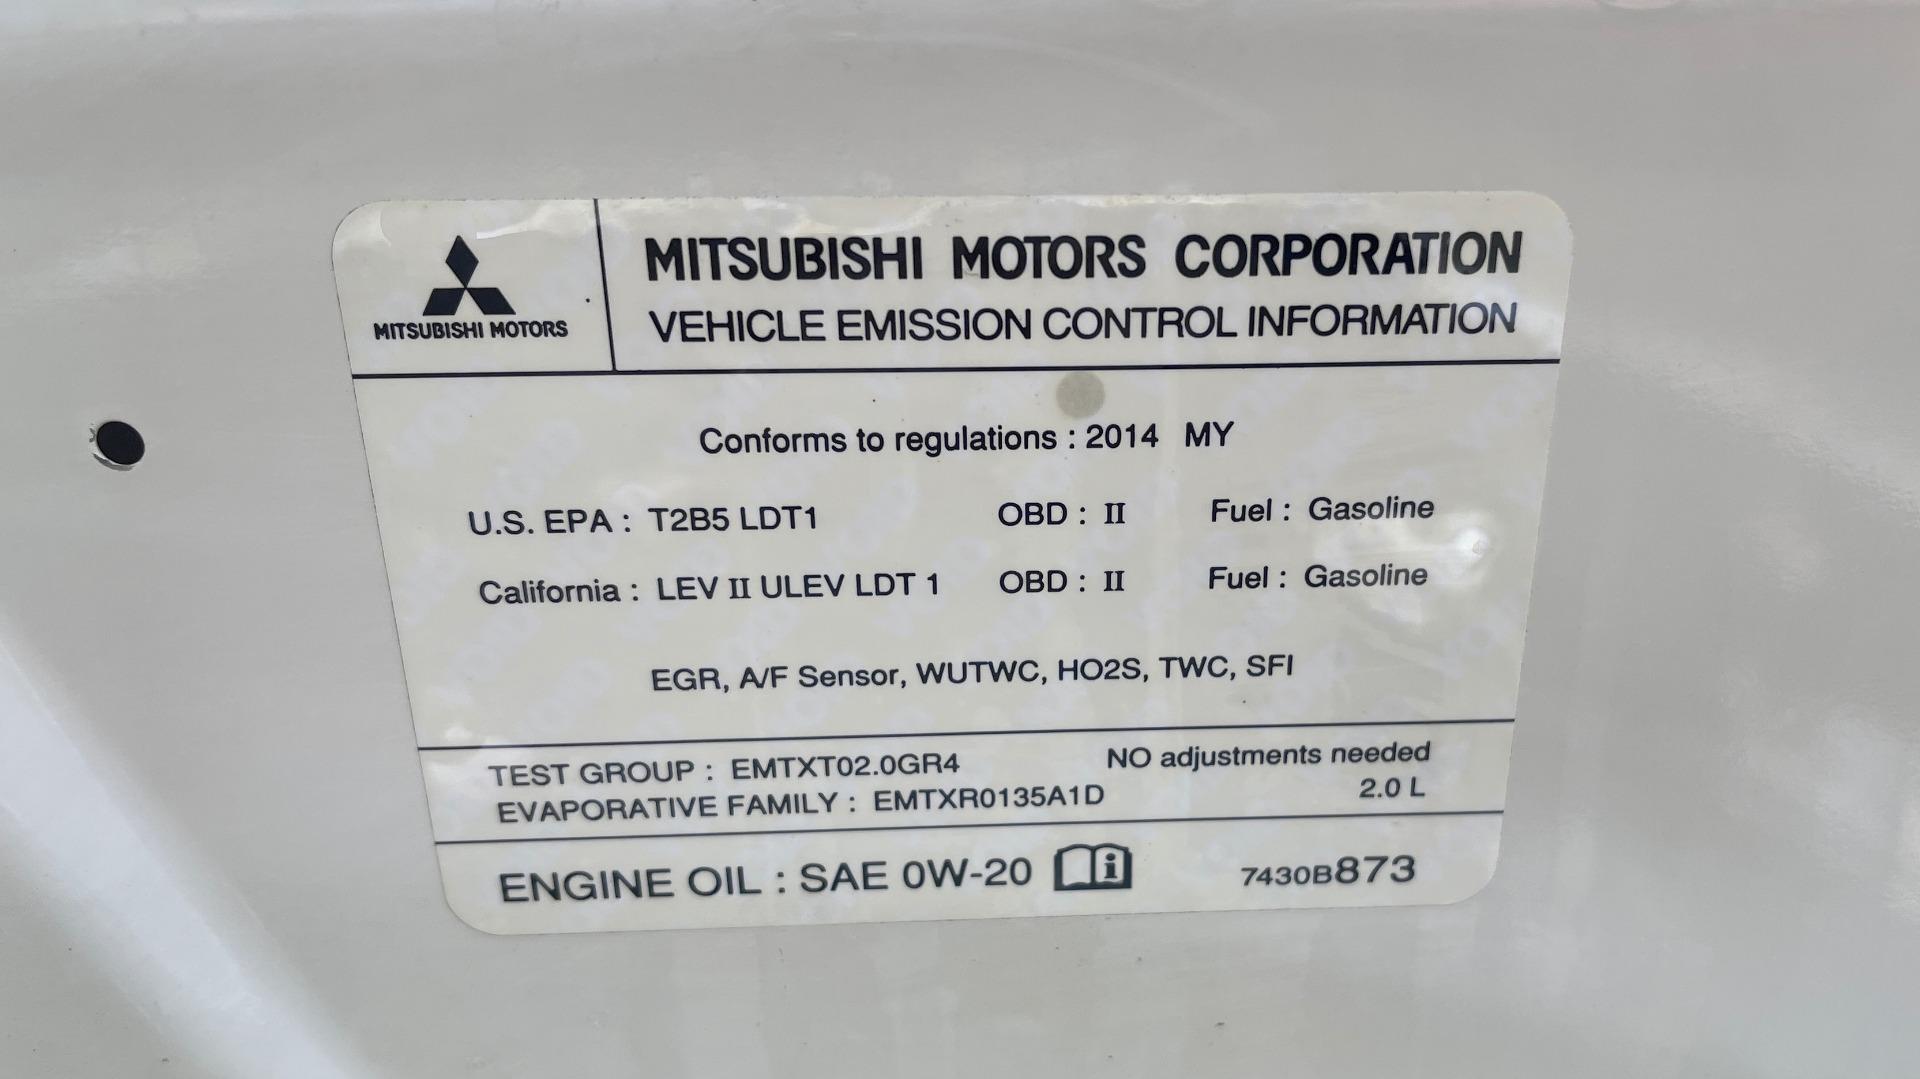 Used 2014 Mitsubishi OUTLANDER SPORT ES 2WD / 2.0L / CVT TRANS / 18IN WHEELS / 31MPG for sale $8,495 at Formula Imports in Charlotte NC 28227 9